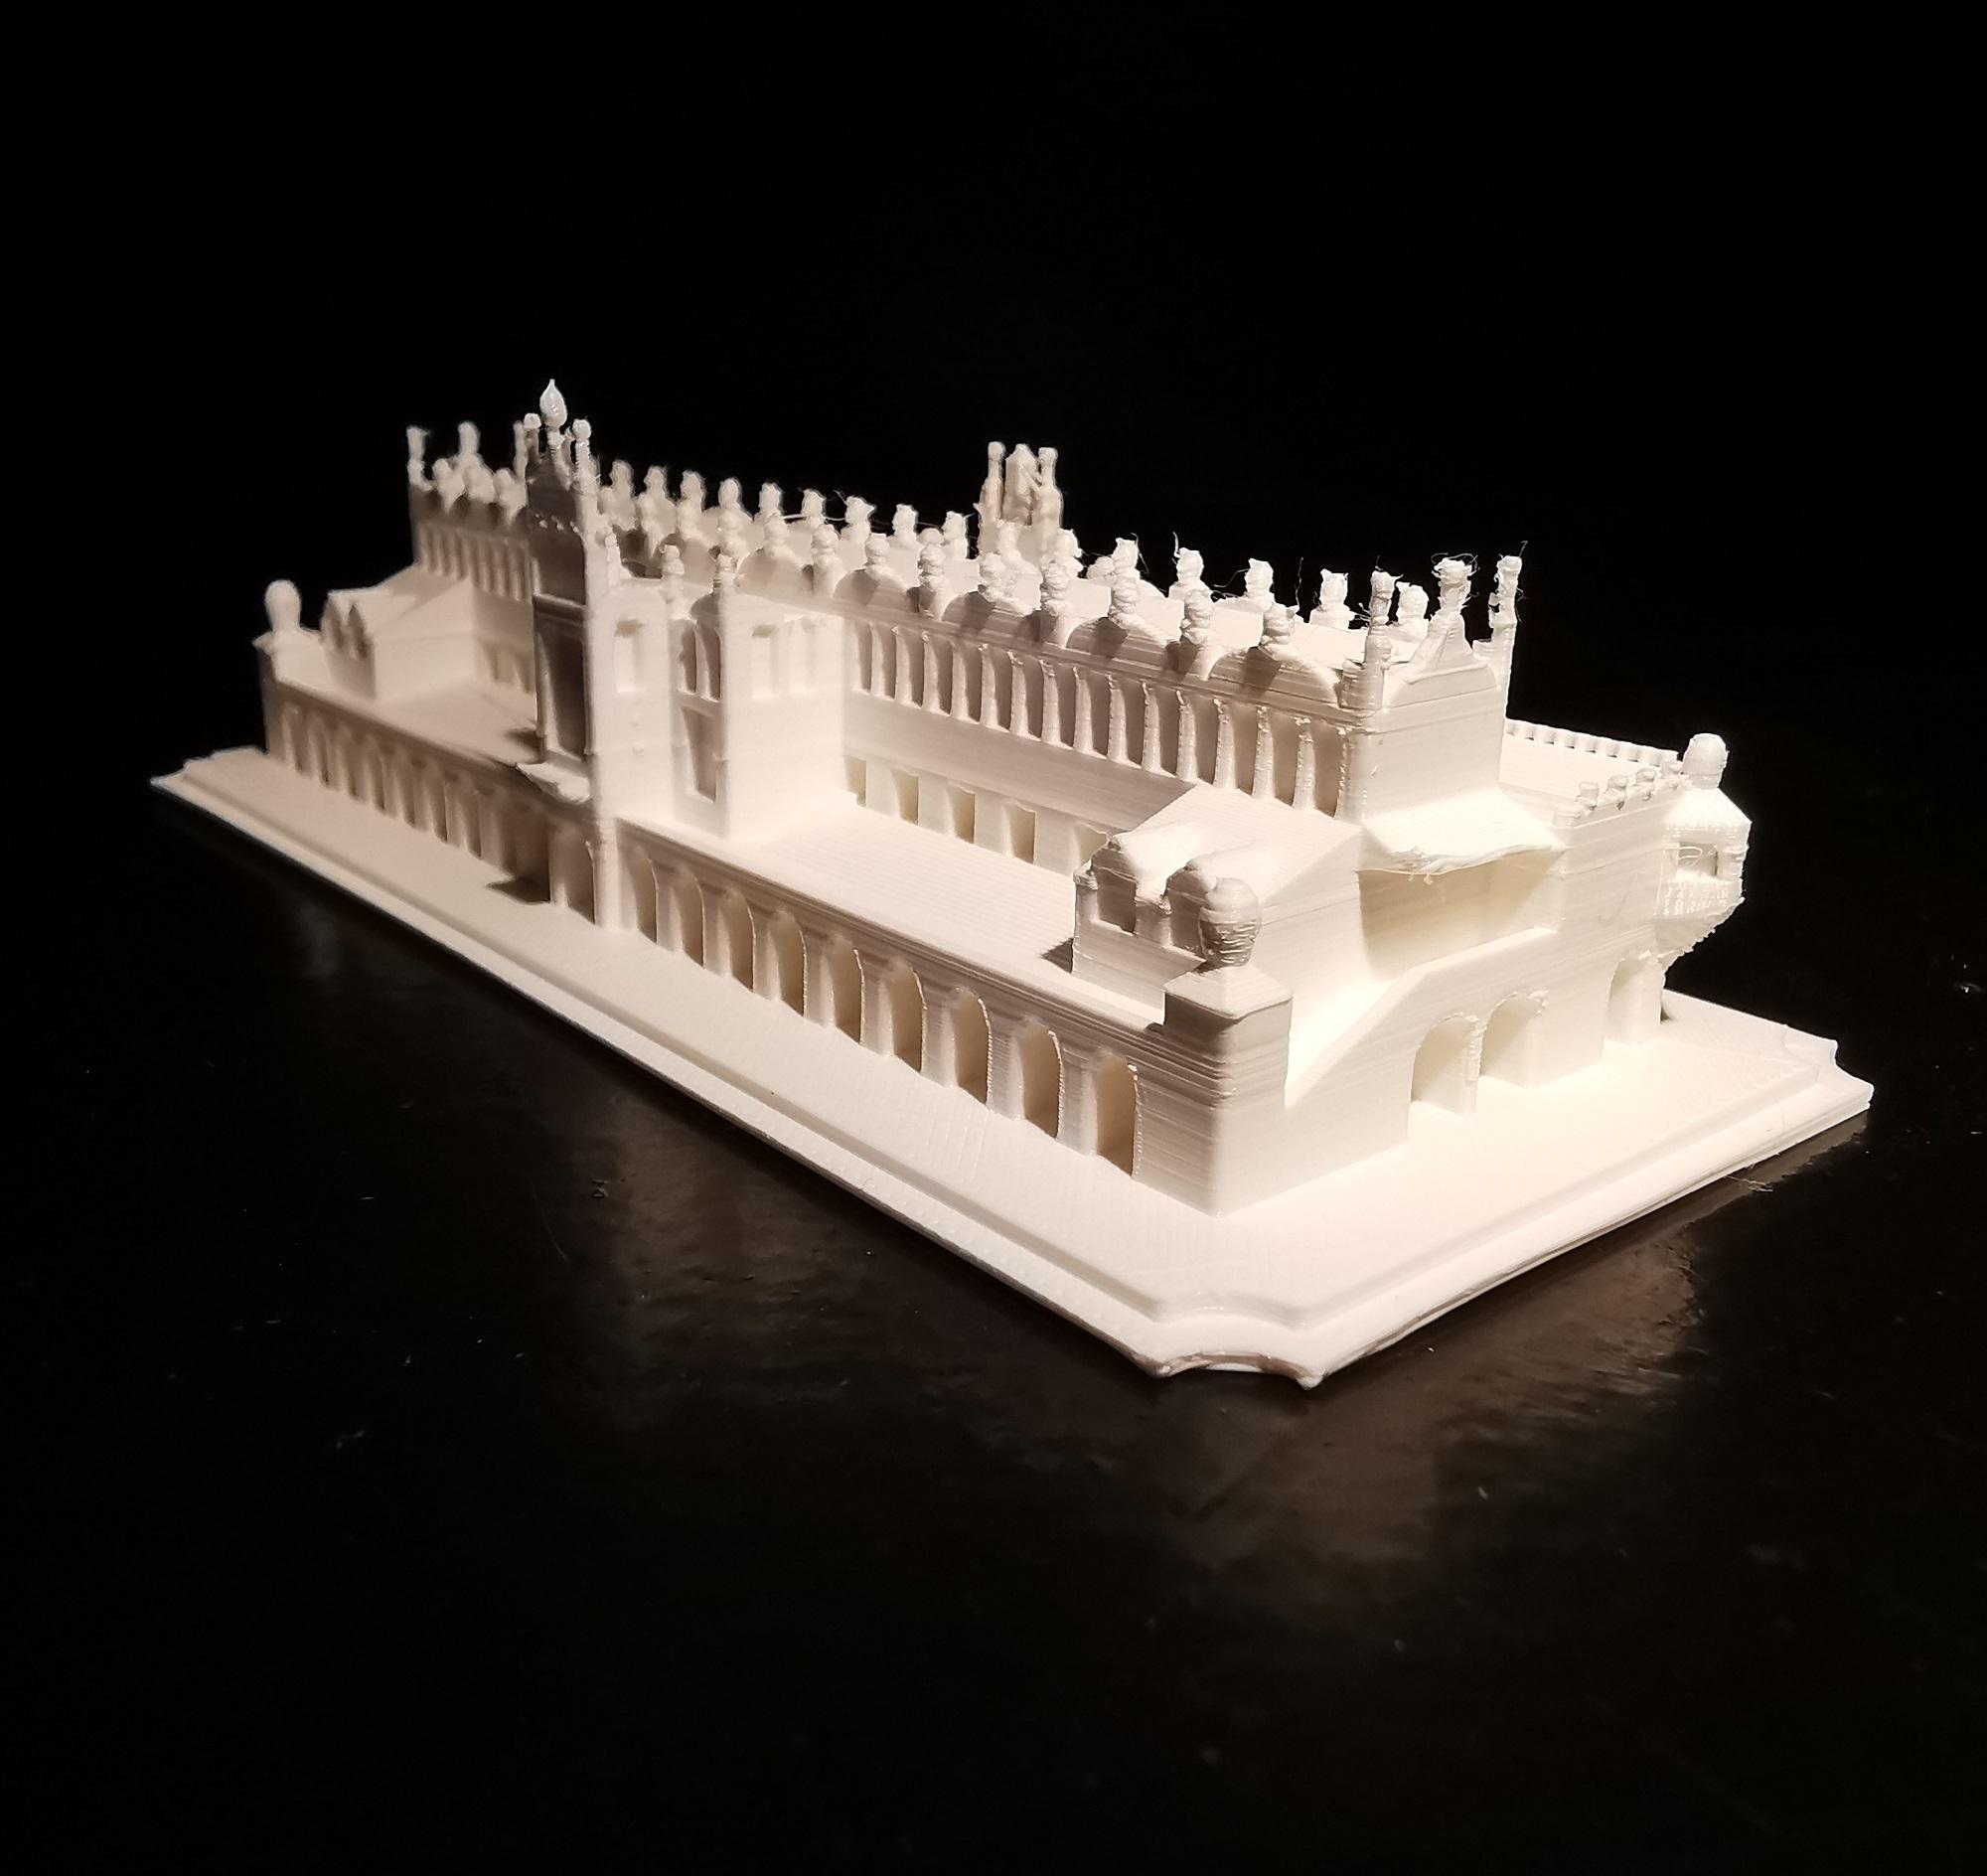 Sukiennice_04.jpg Download STL file Sukiennice - Kraków Cloth Hall • 3D printable design, eAgent